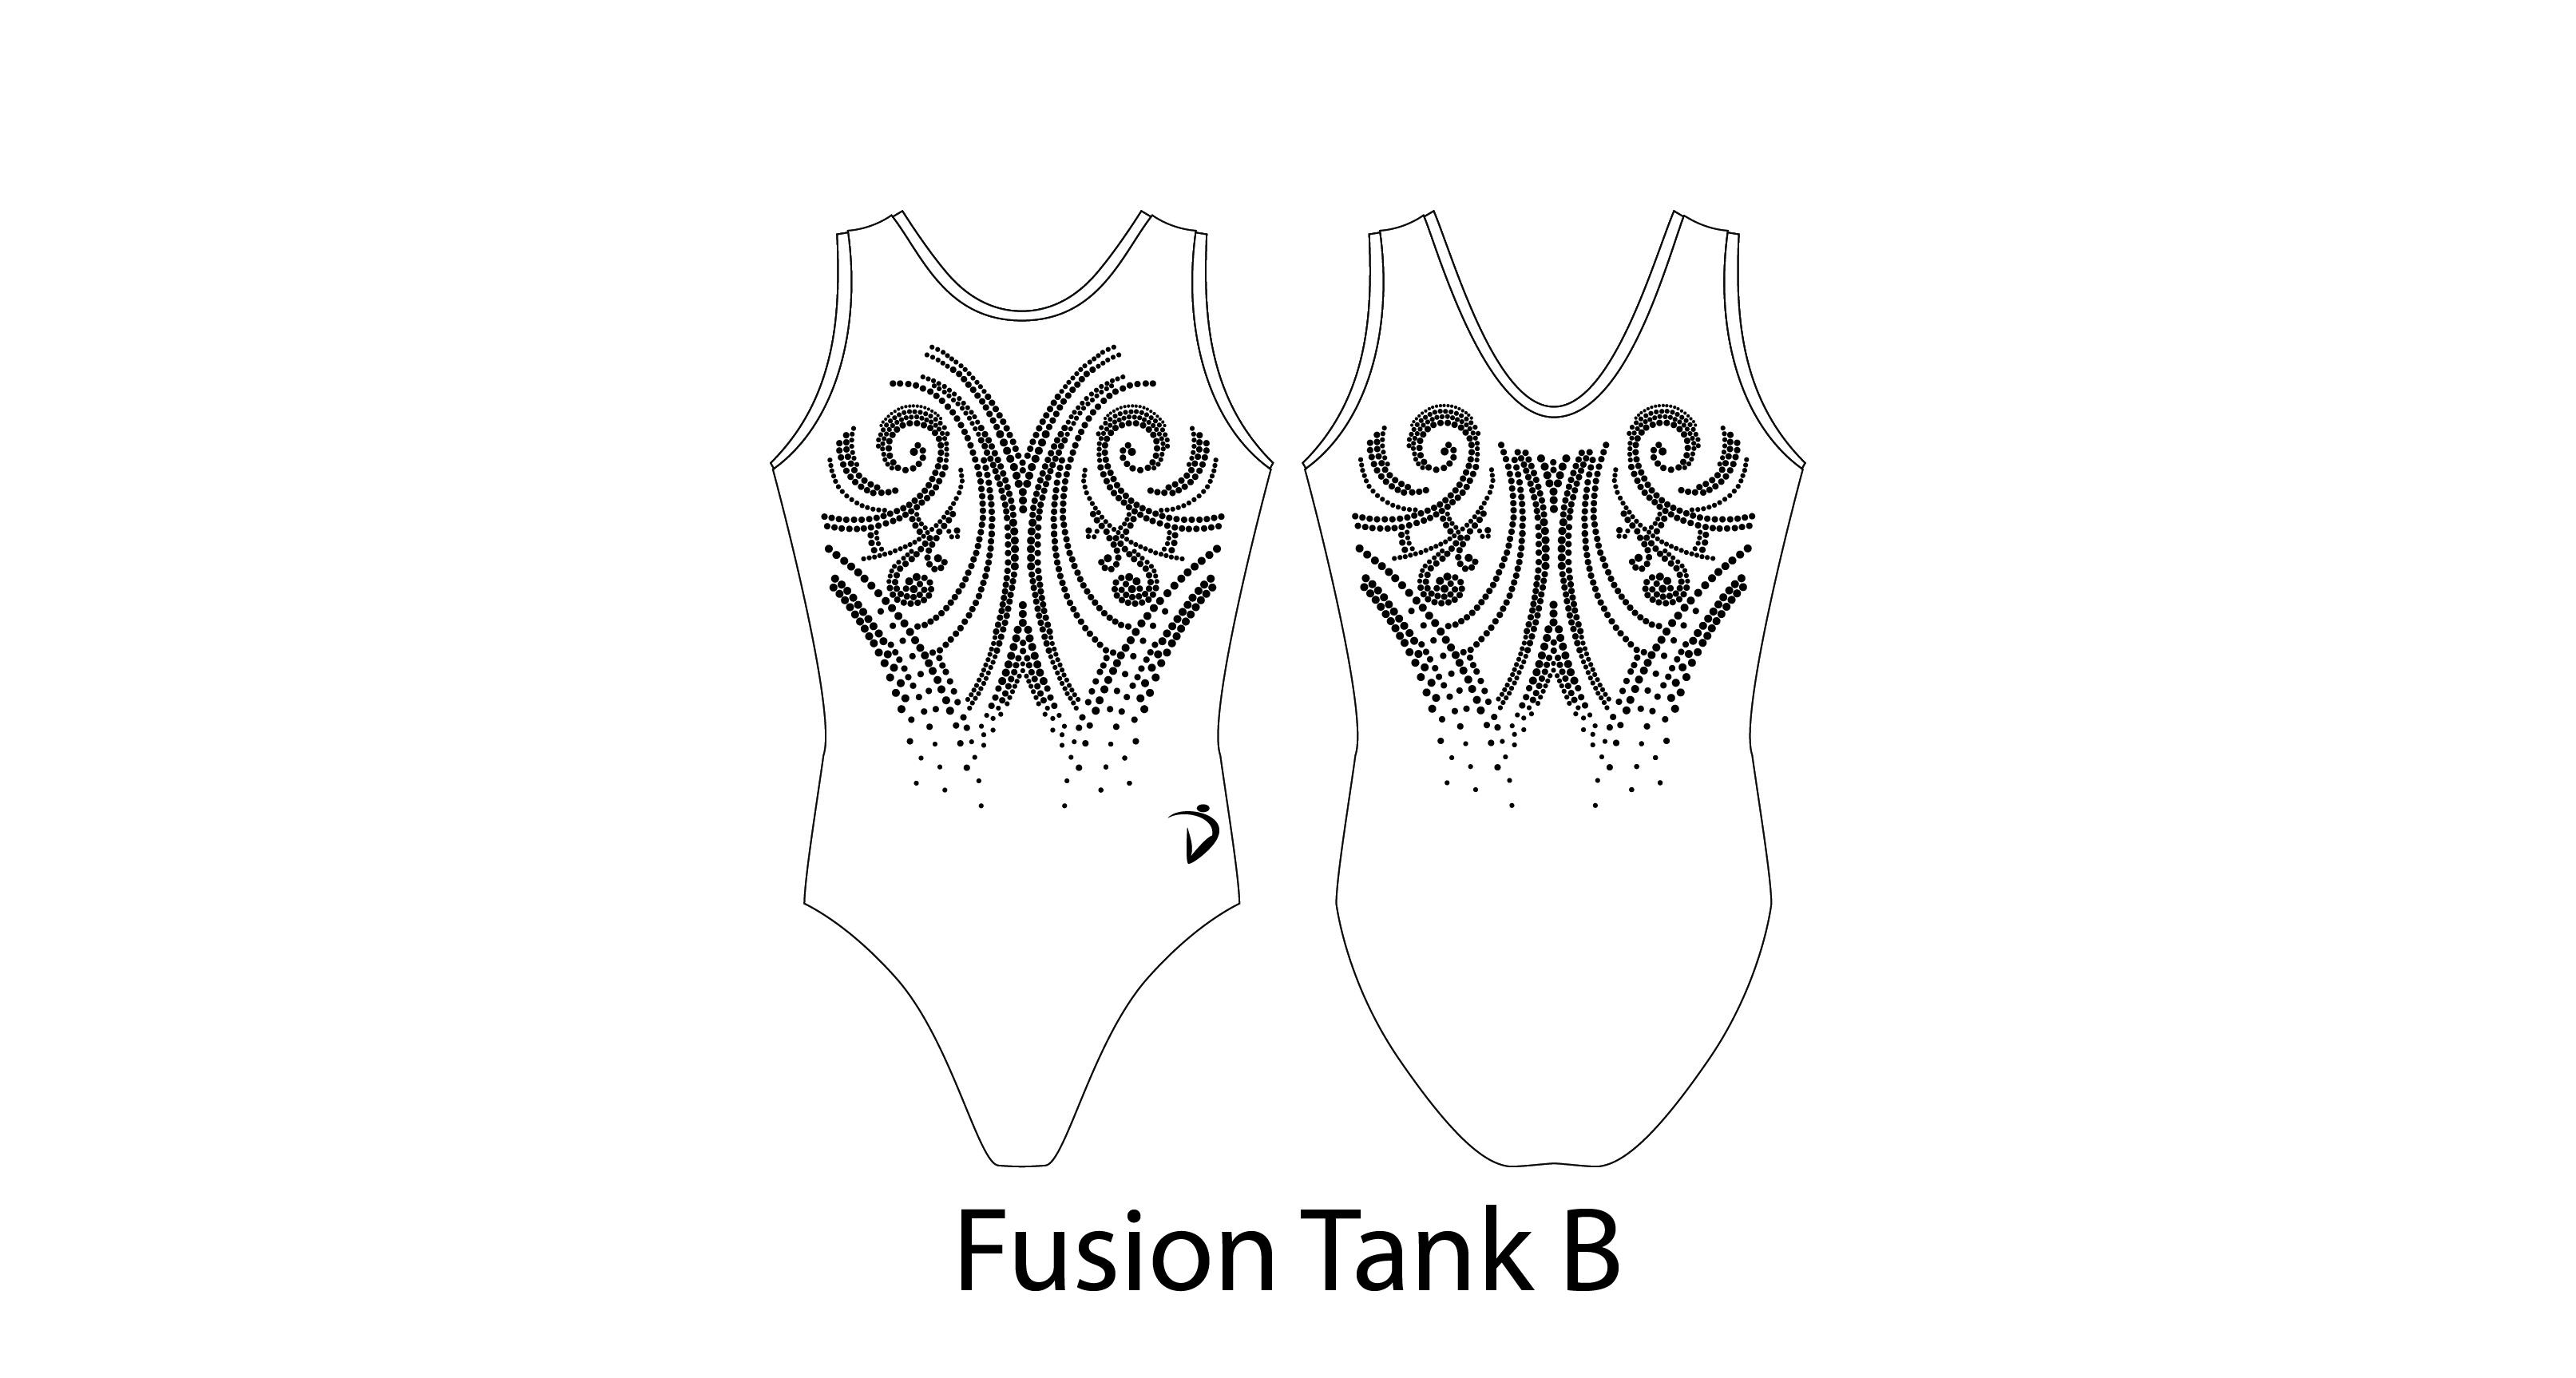 Fusion Tank B